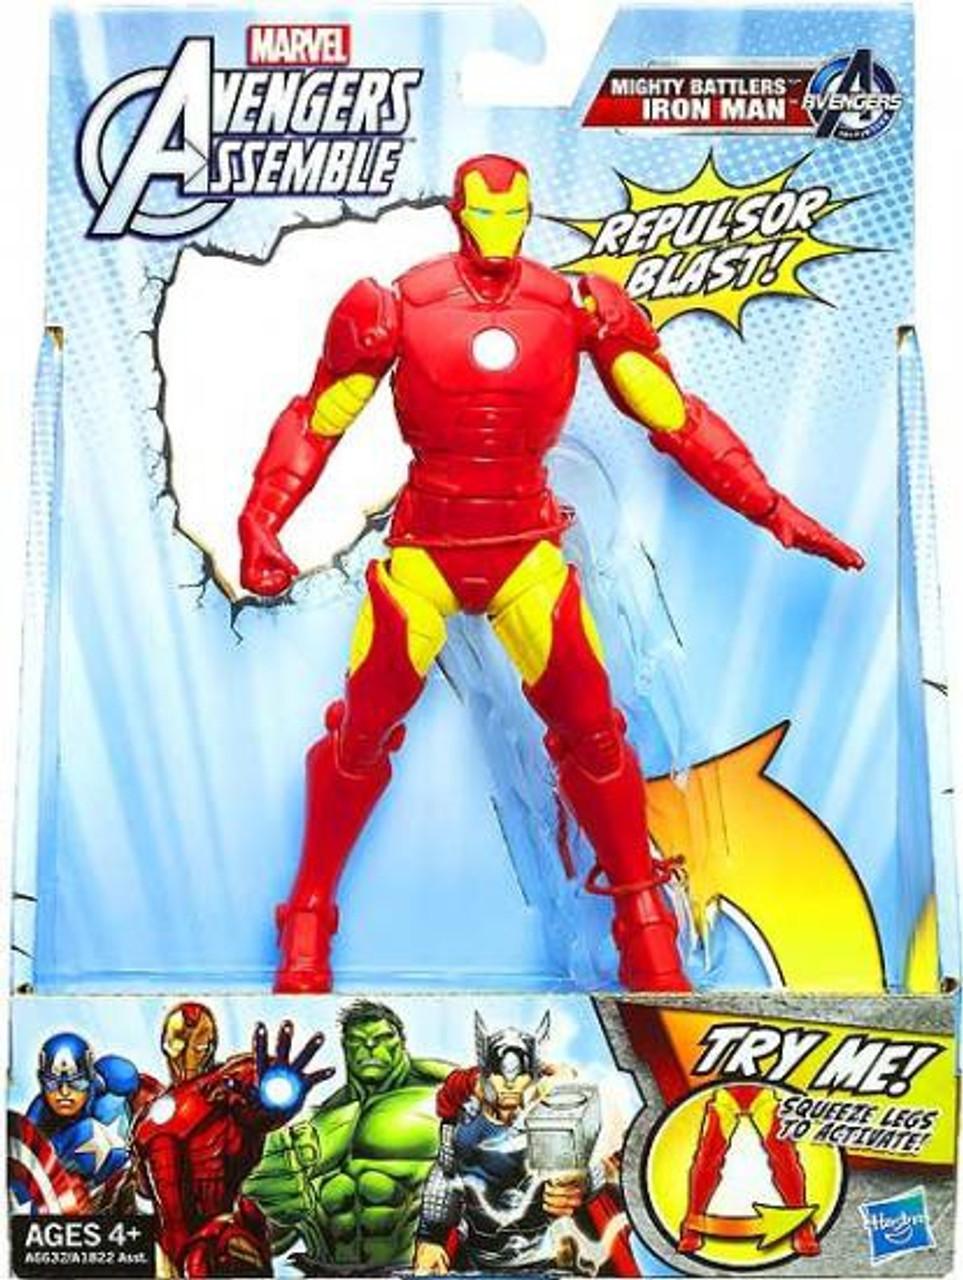 ee95bc7036284e Marvel Avengers Assemble Mighty Battlers Iron Man Action Figure Hasbro Toys  - ToyWiz